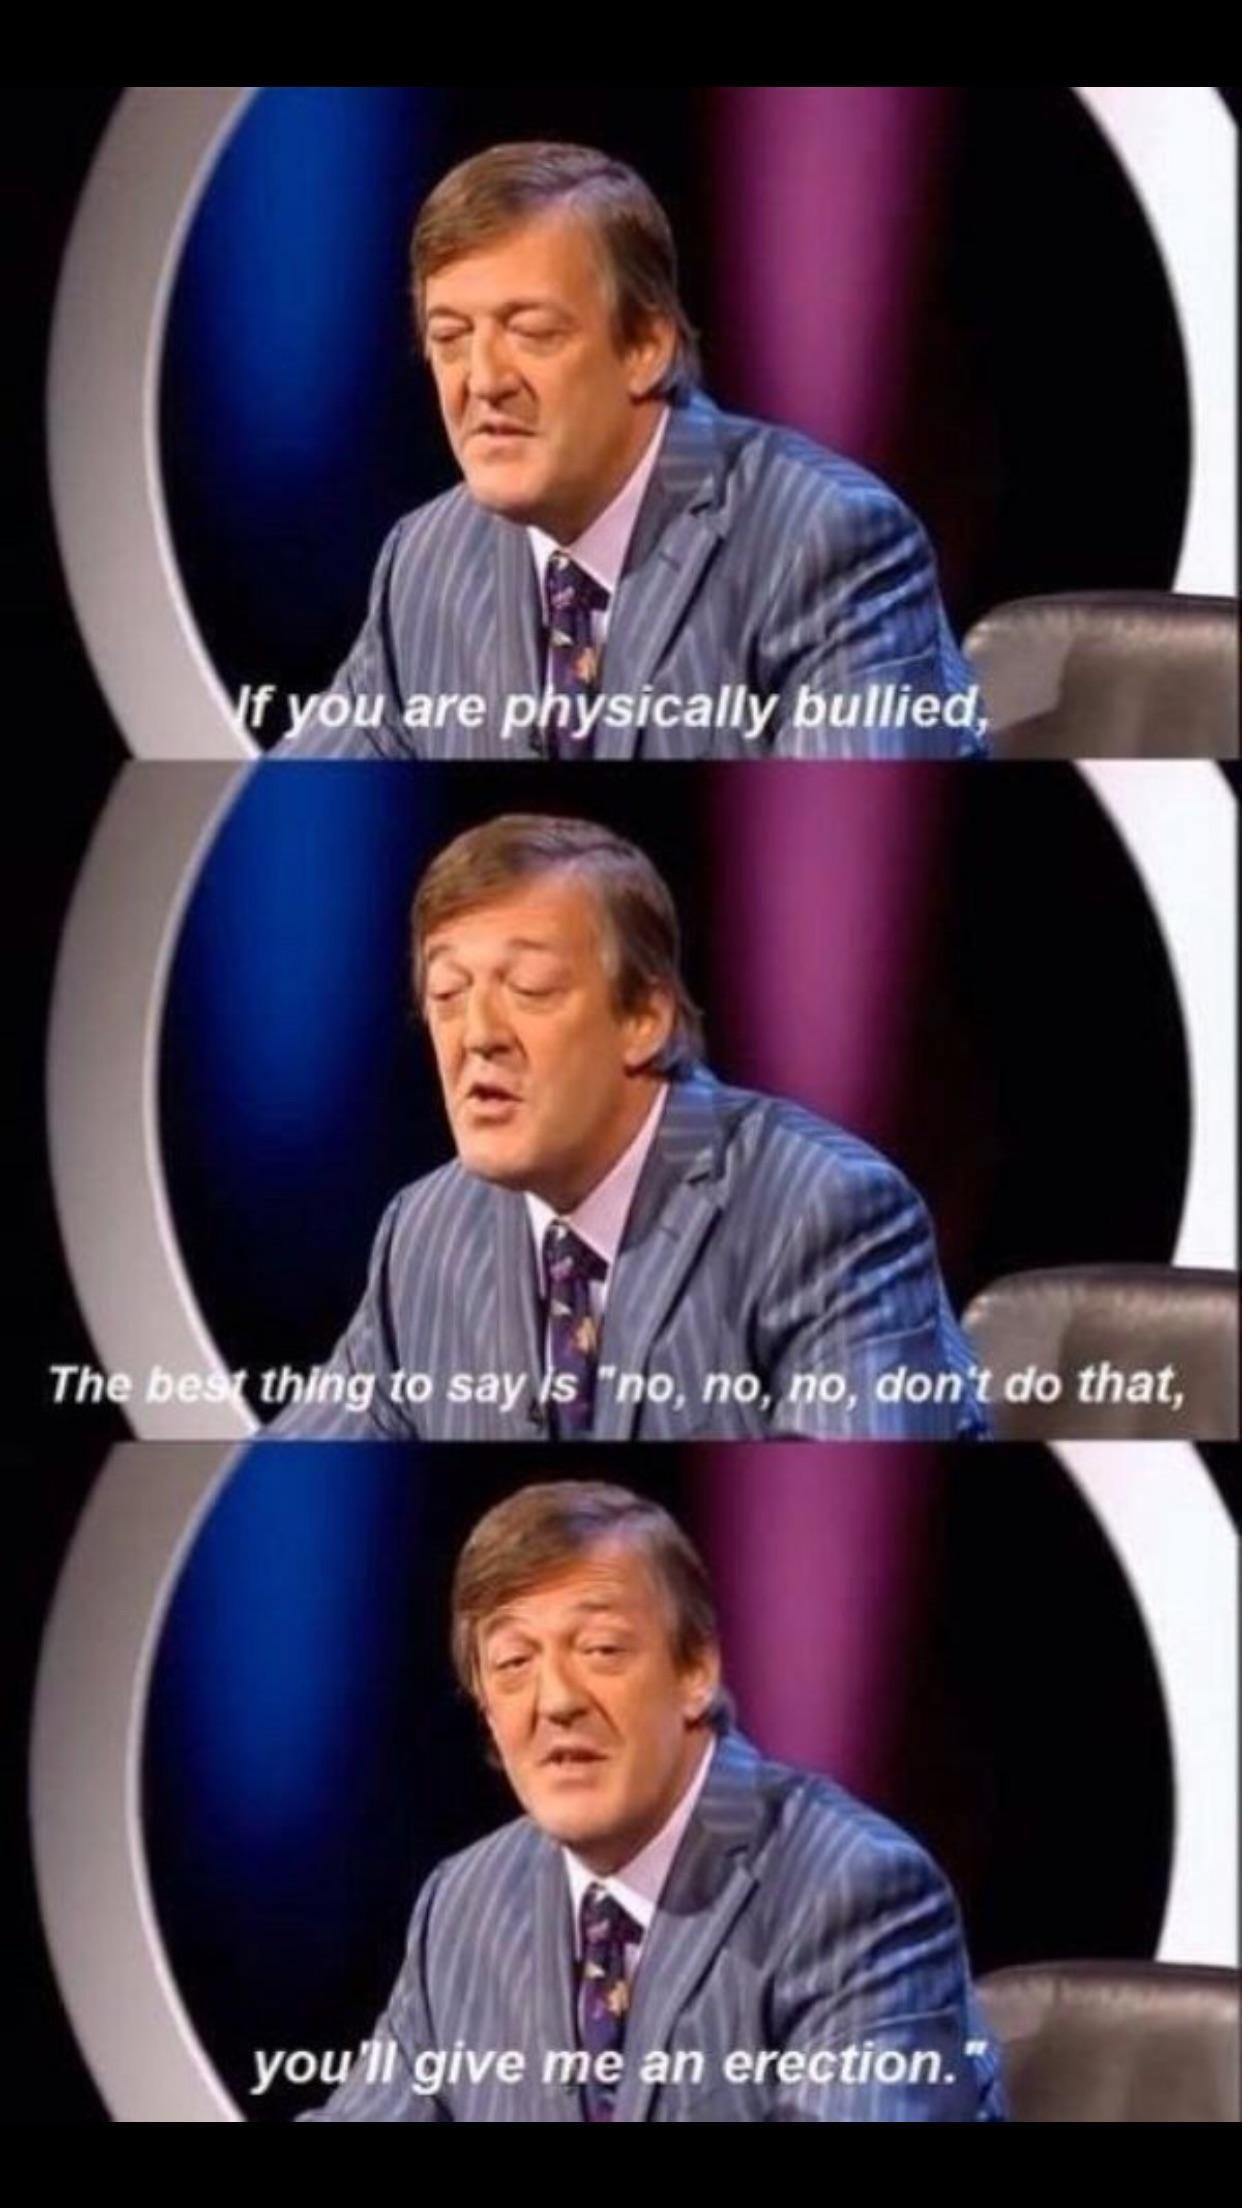 Will always prevent bullying